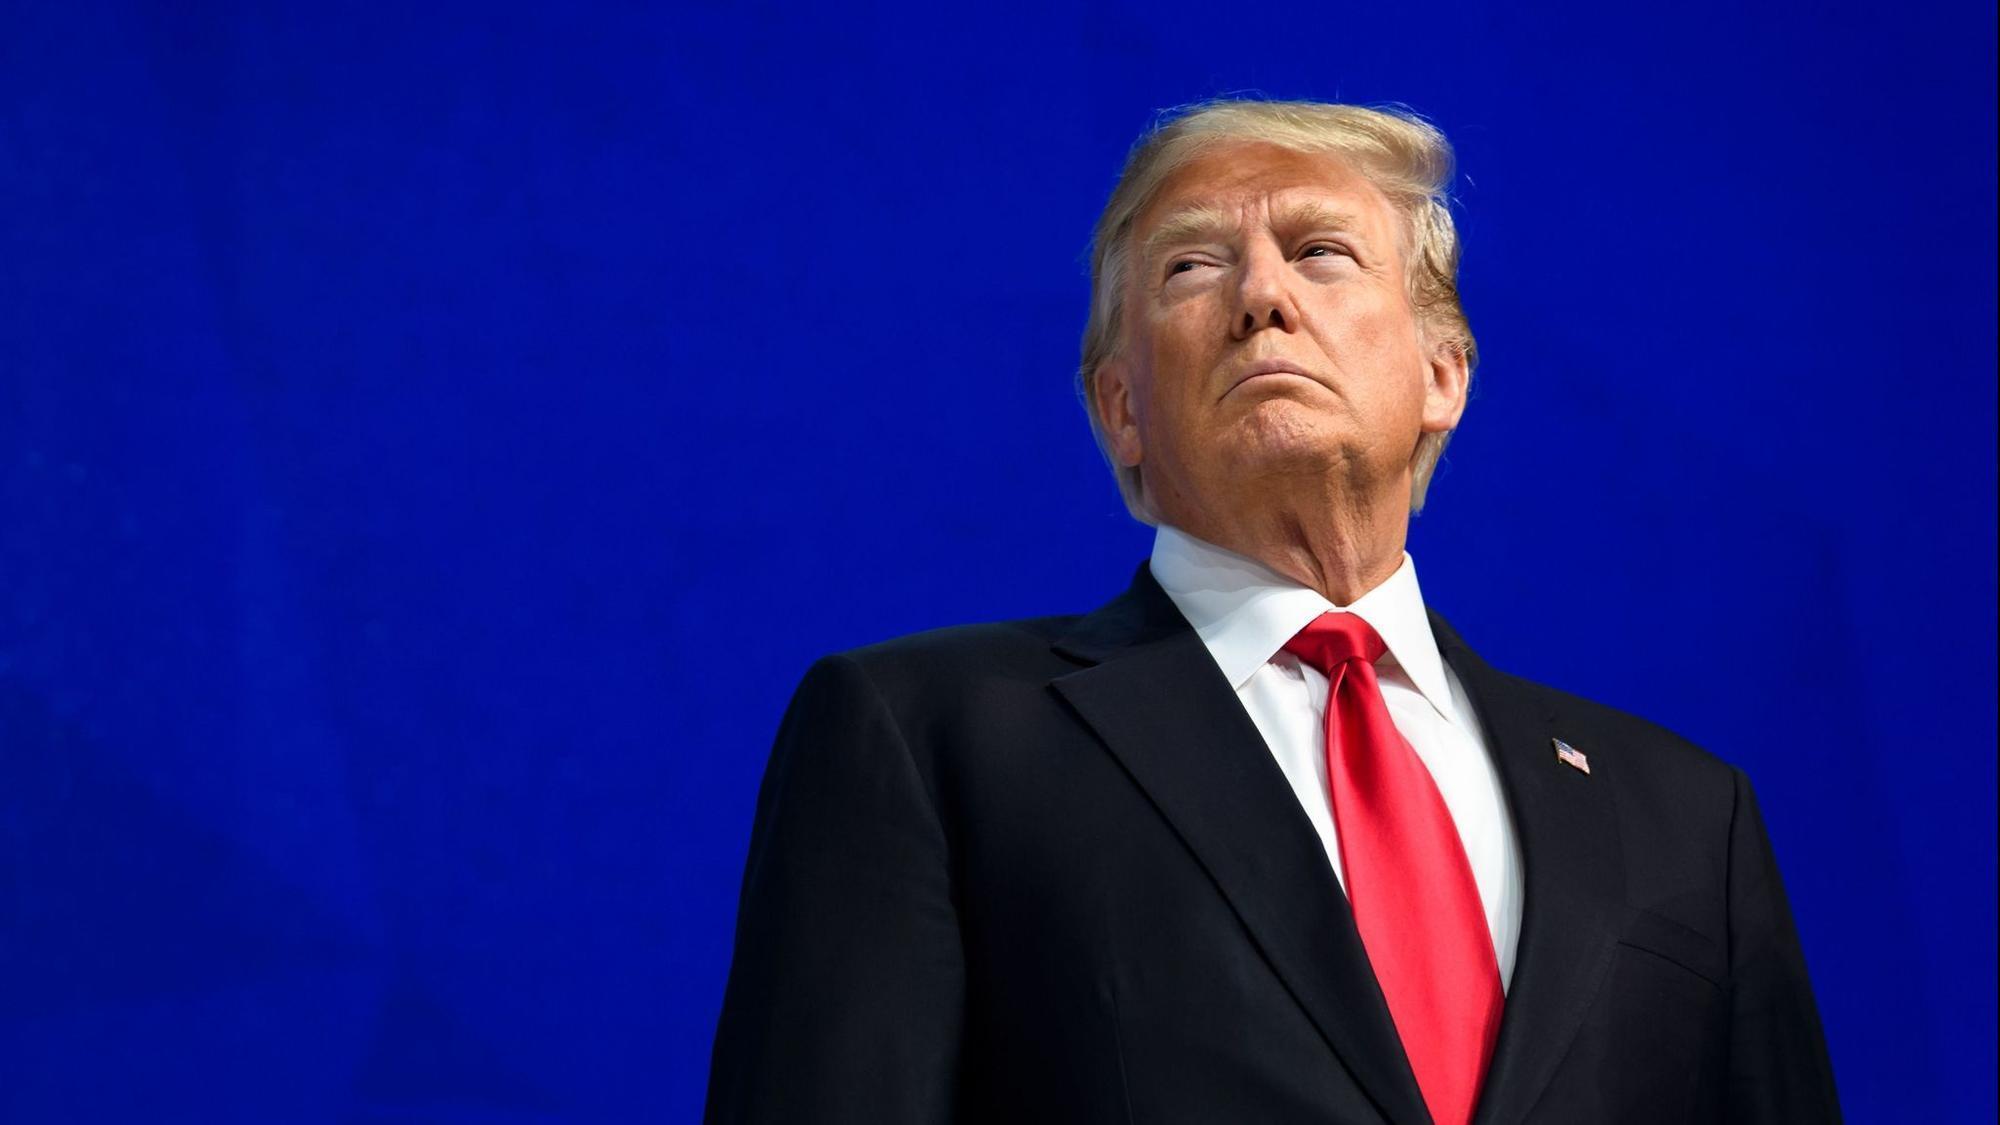 Will Trump brave an interview with Mueller? - Chicago Tribune